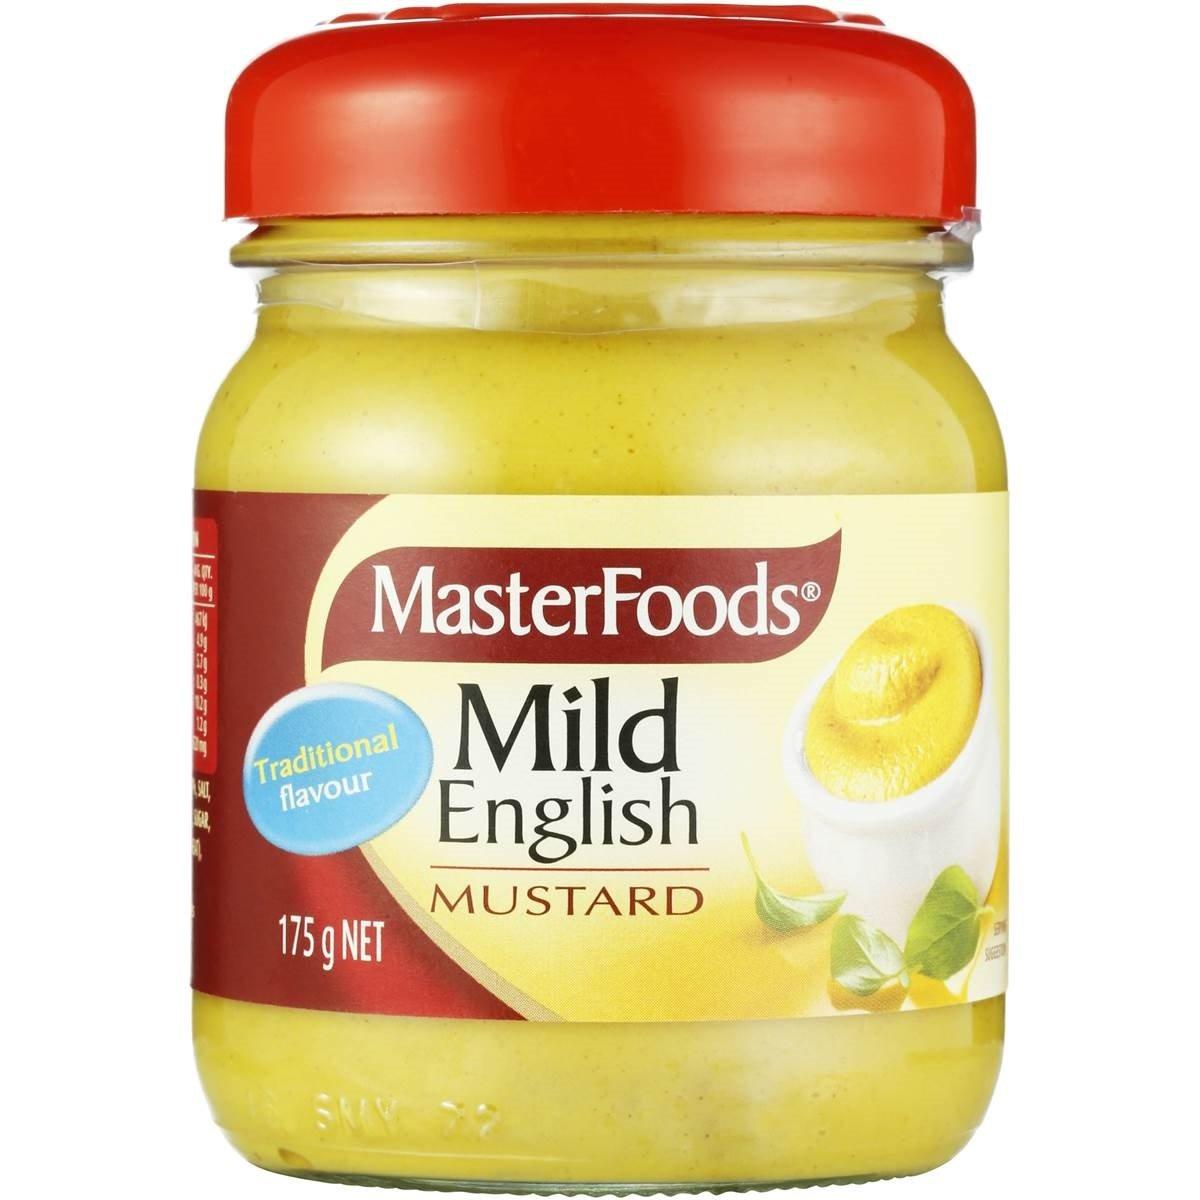 Masterfood Mustard Mild English 175g